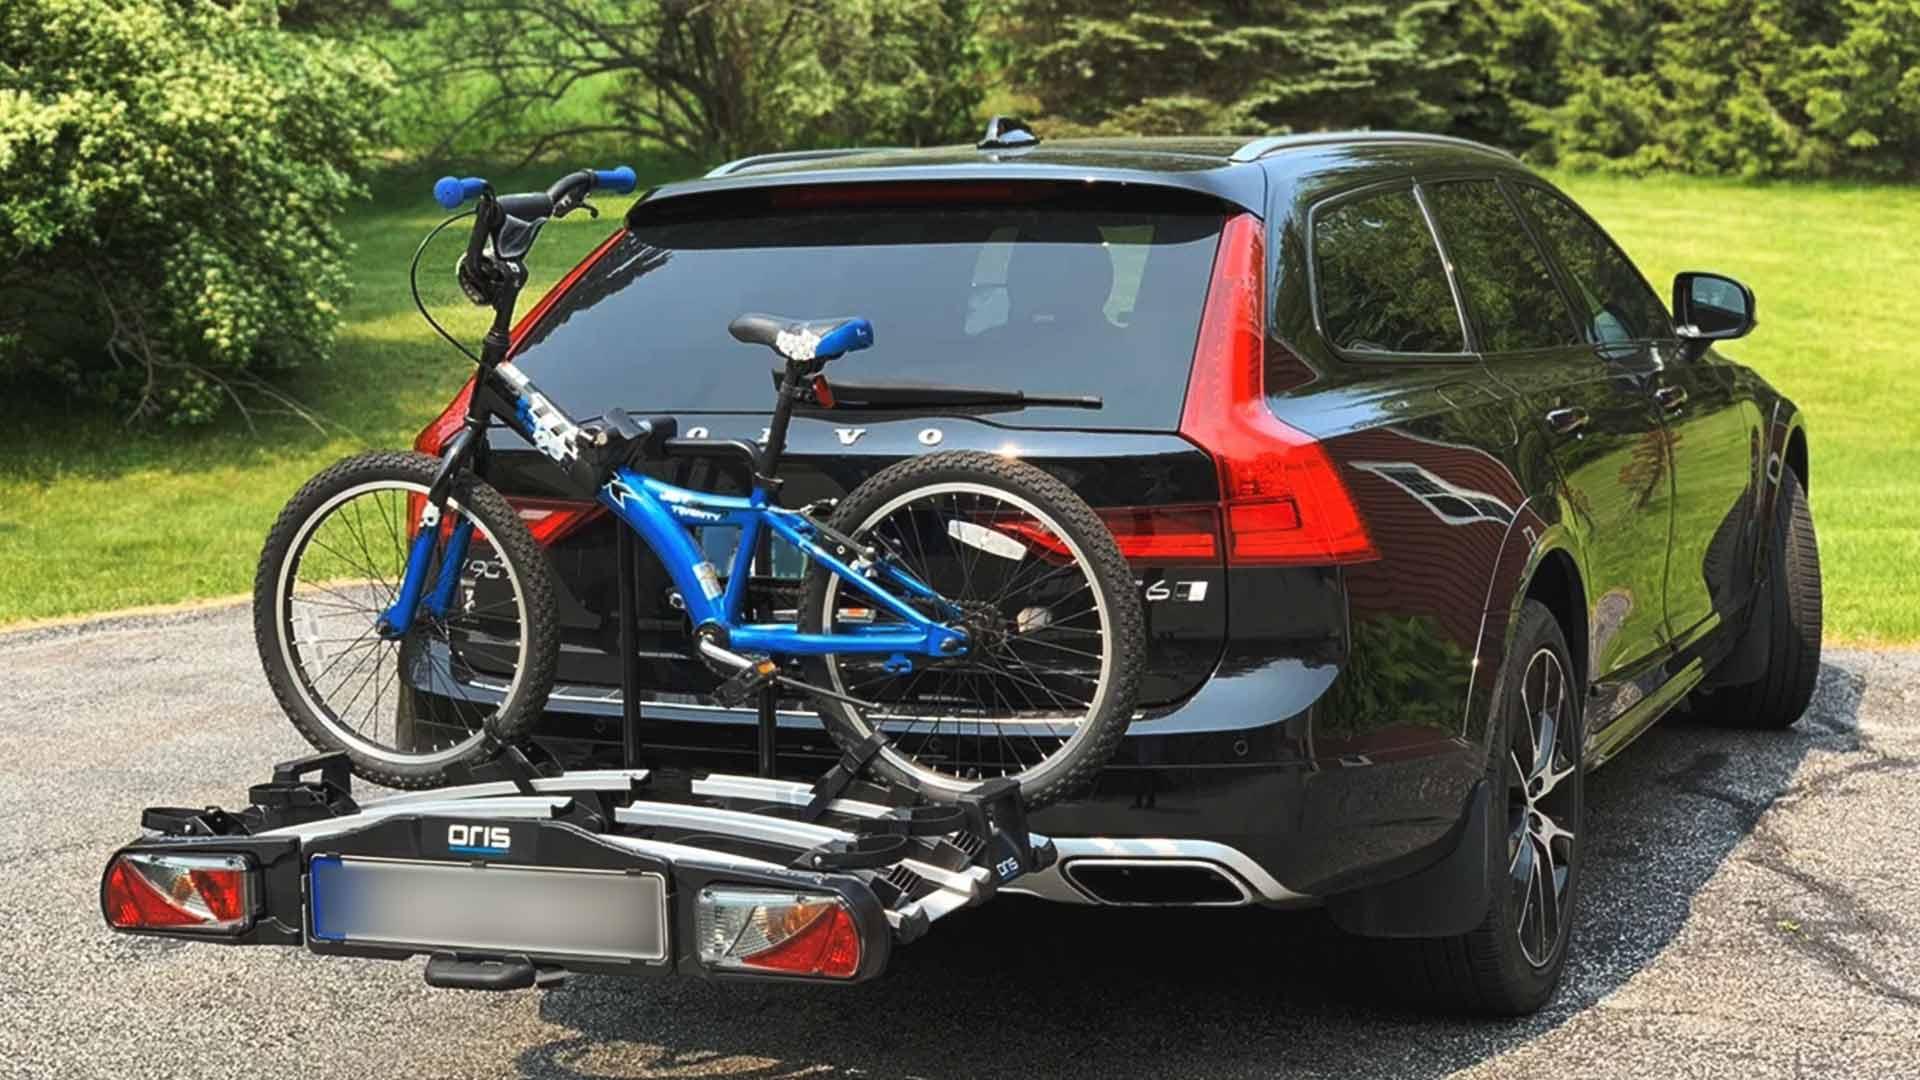 volvo v60 bike rack